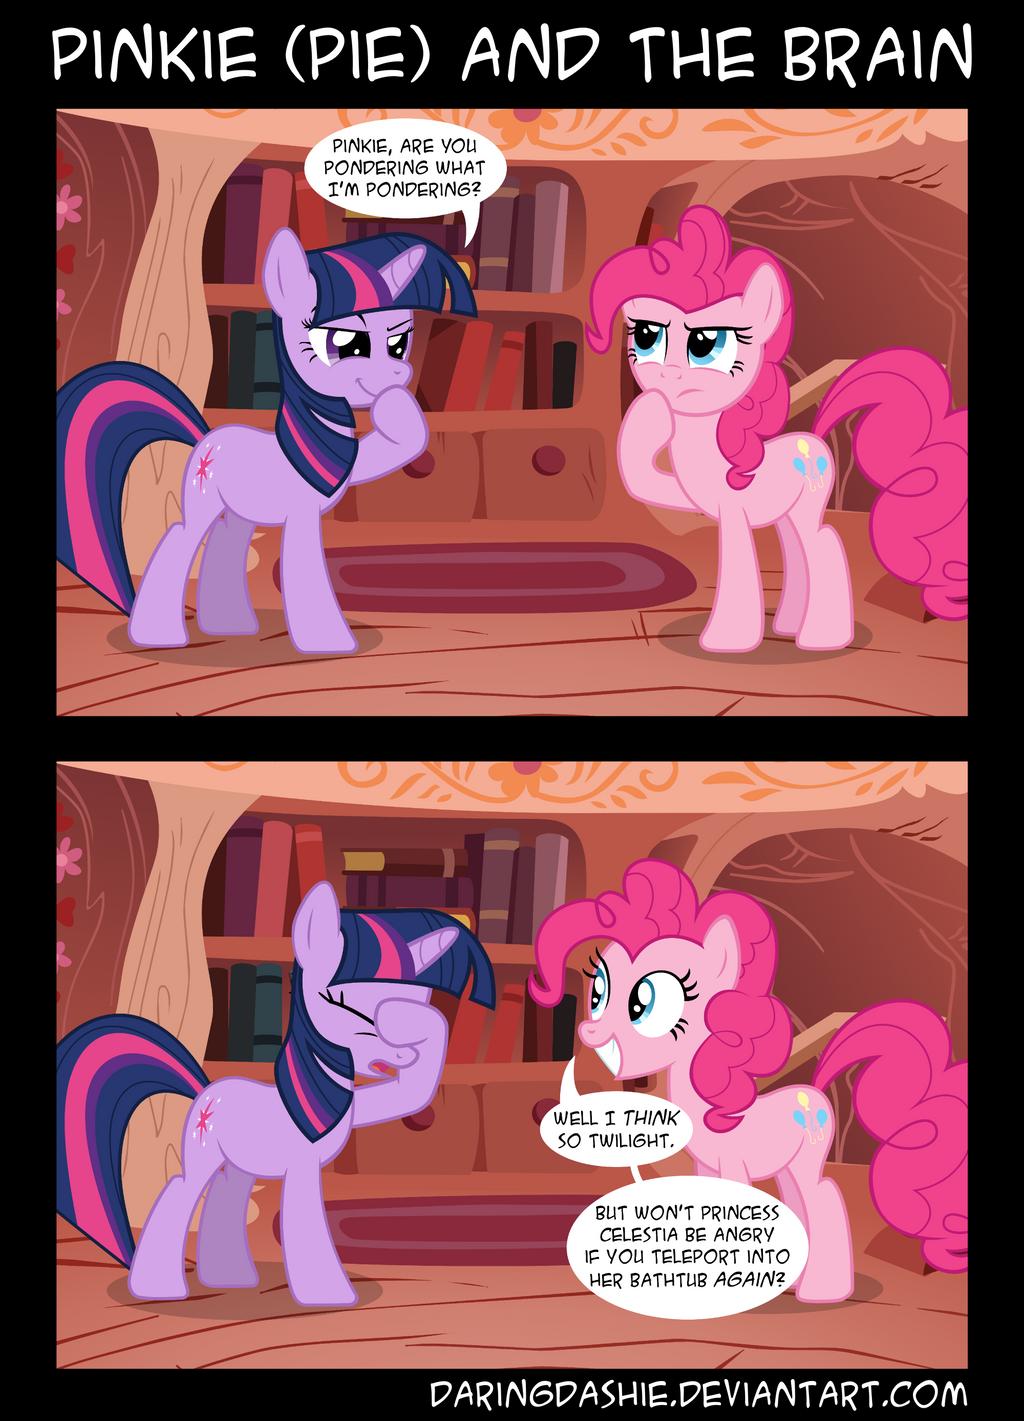 Pinkie (Pie) and the Brain by DaringDashie